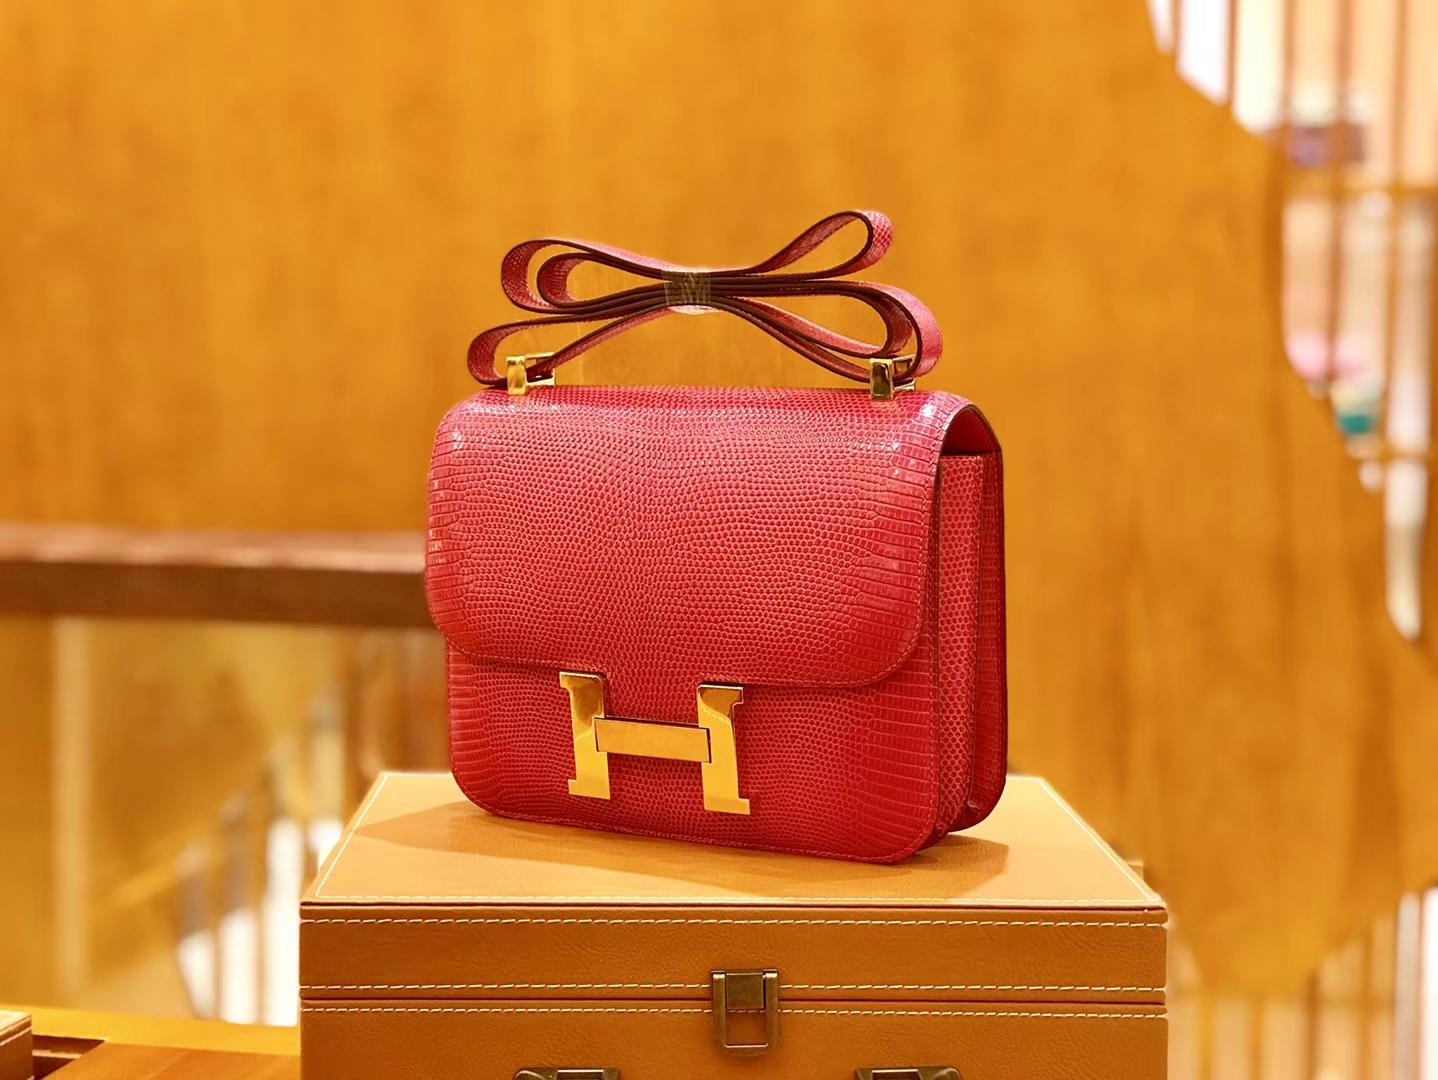 Hermès(爱马仕)Constance 空姐包 蜥蜴皮 桃红色 极致粉 24cm